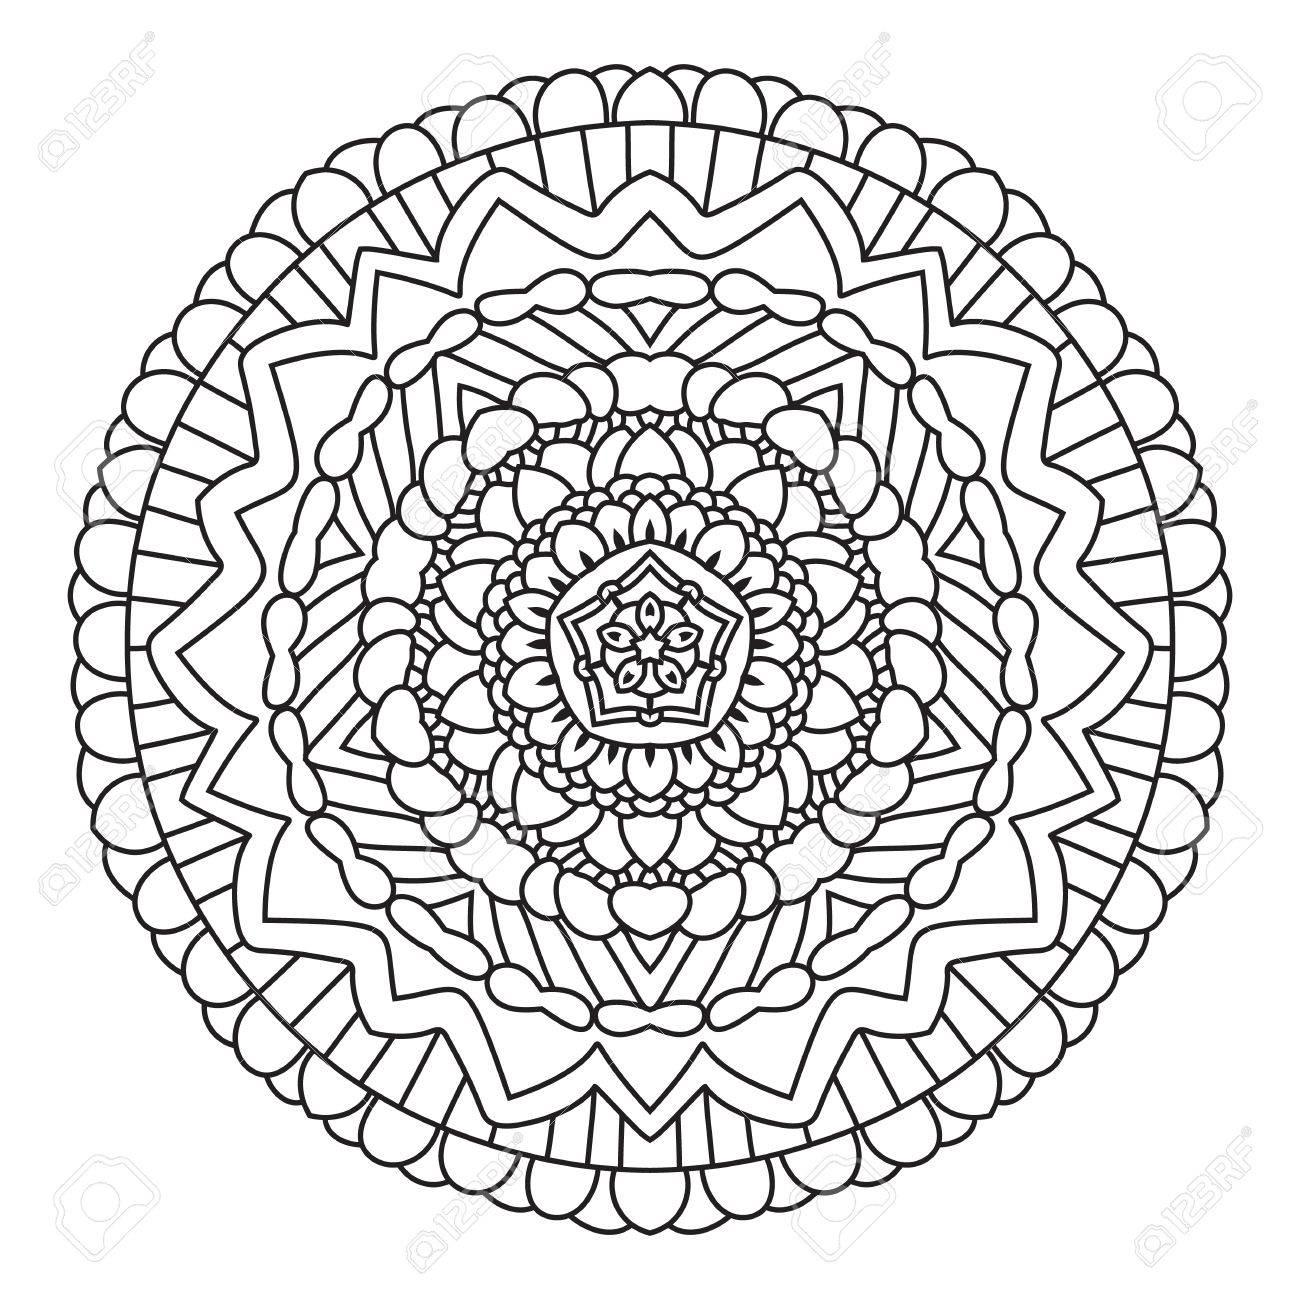 Circular Patrón étnica Simétrica. Mandala Para Colorear Aislado